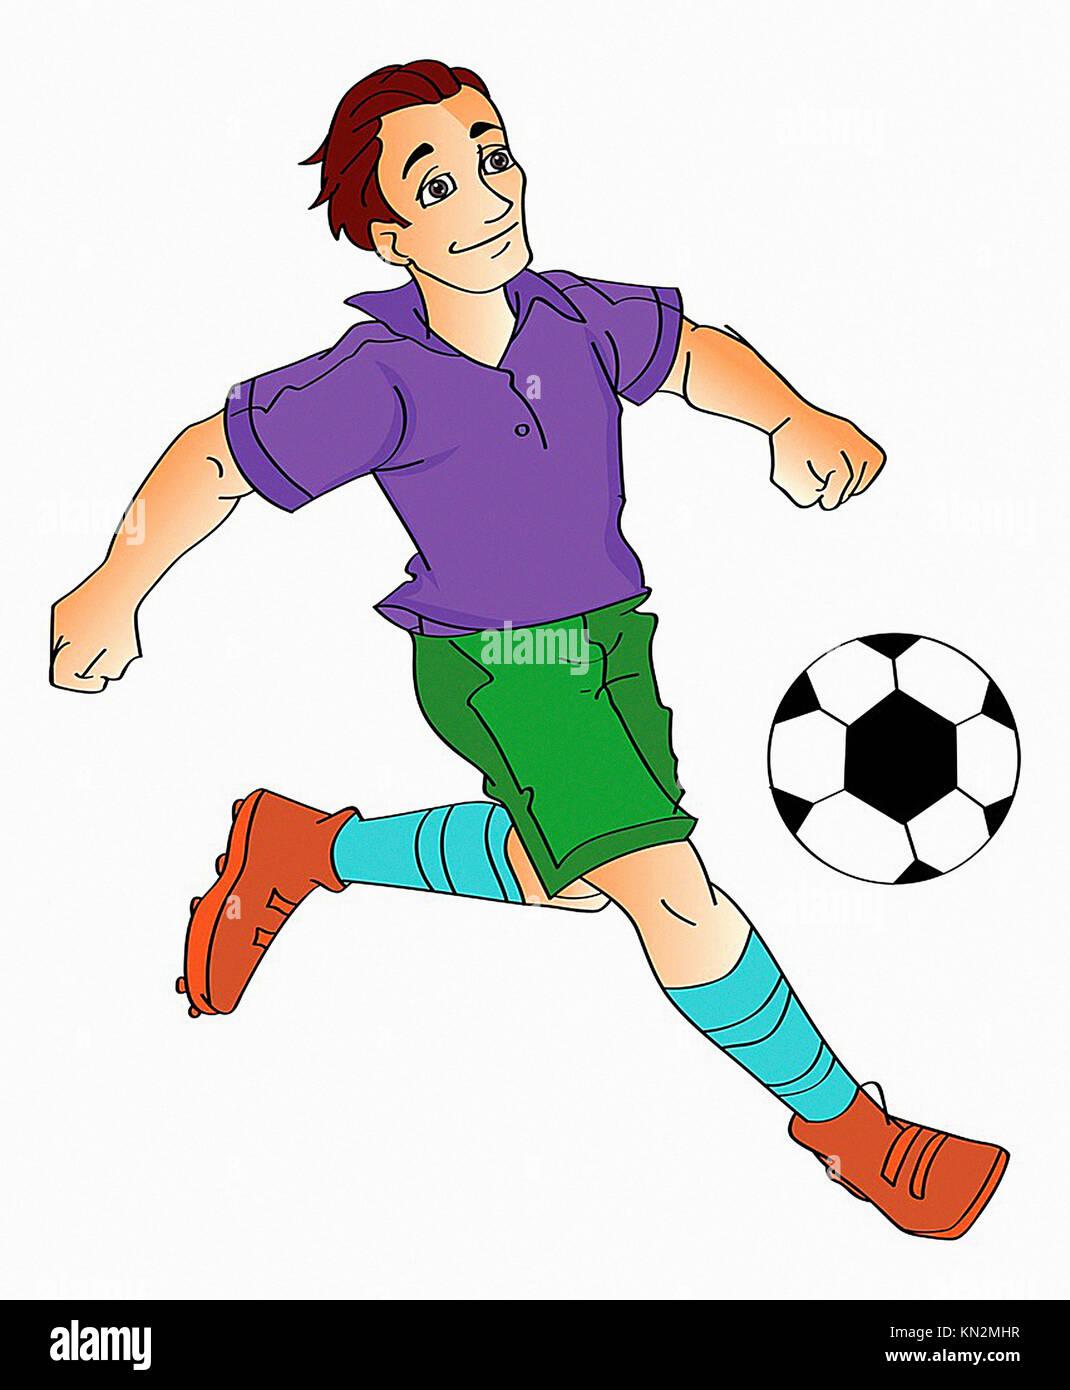 Junge Menschen spielen Fußball, Vektor-illustration Stockbild